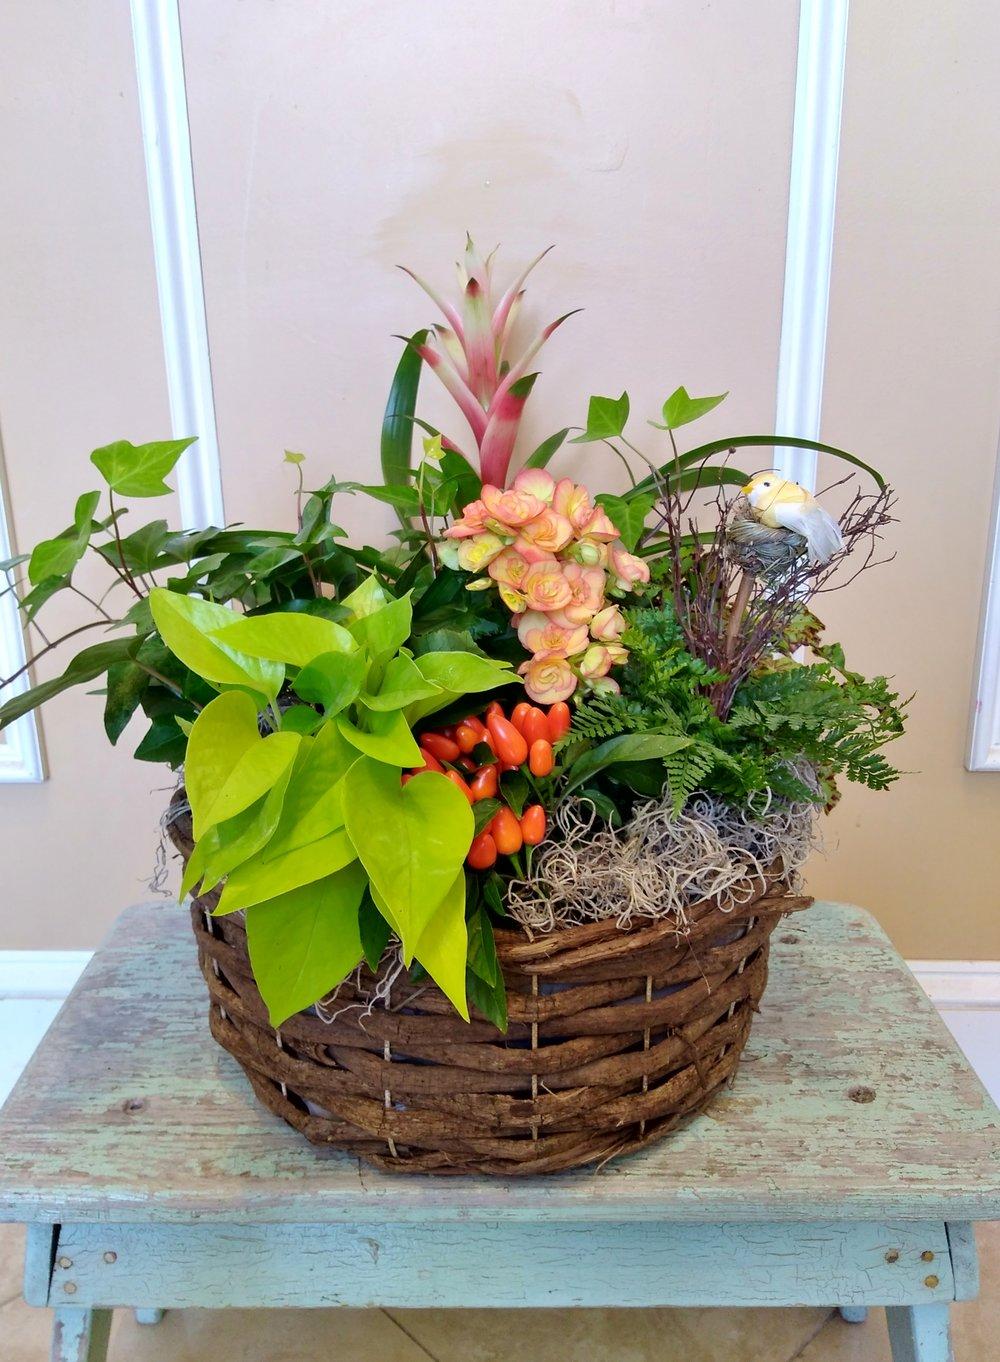 C2 $60-$150 European plant basket. $100 as shown.